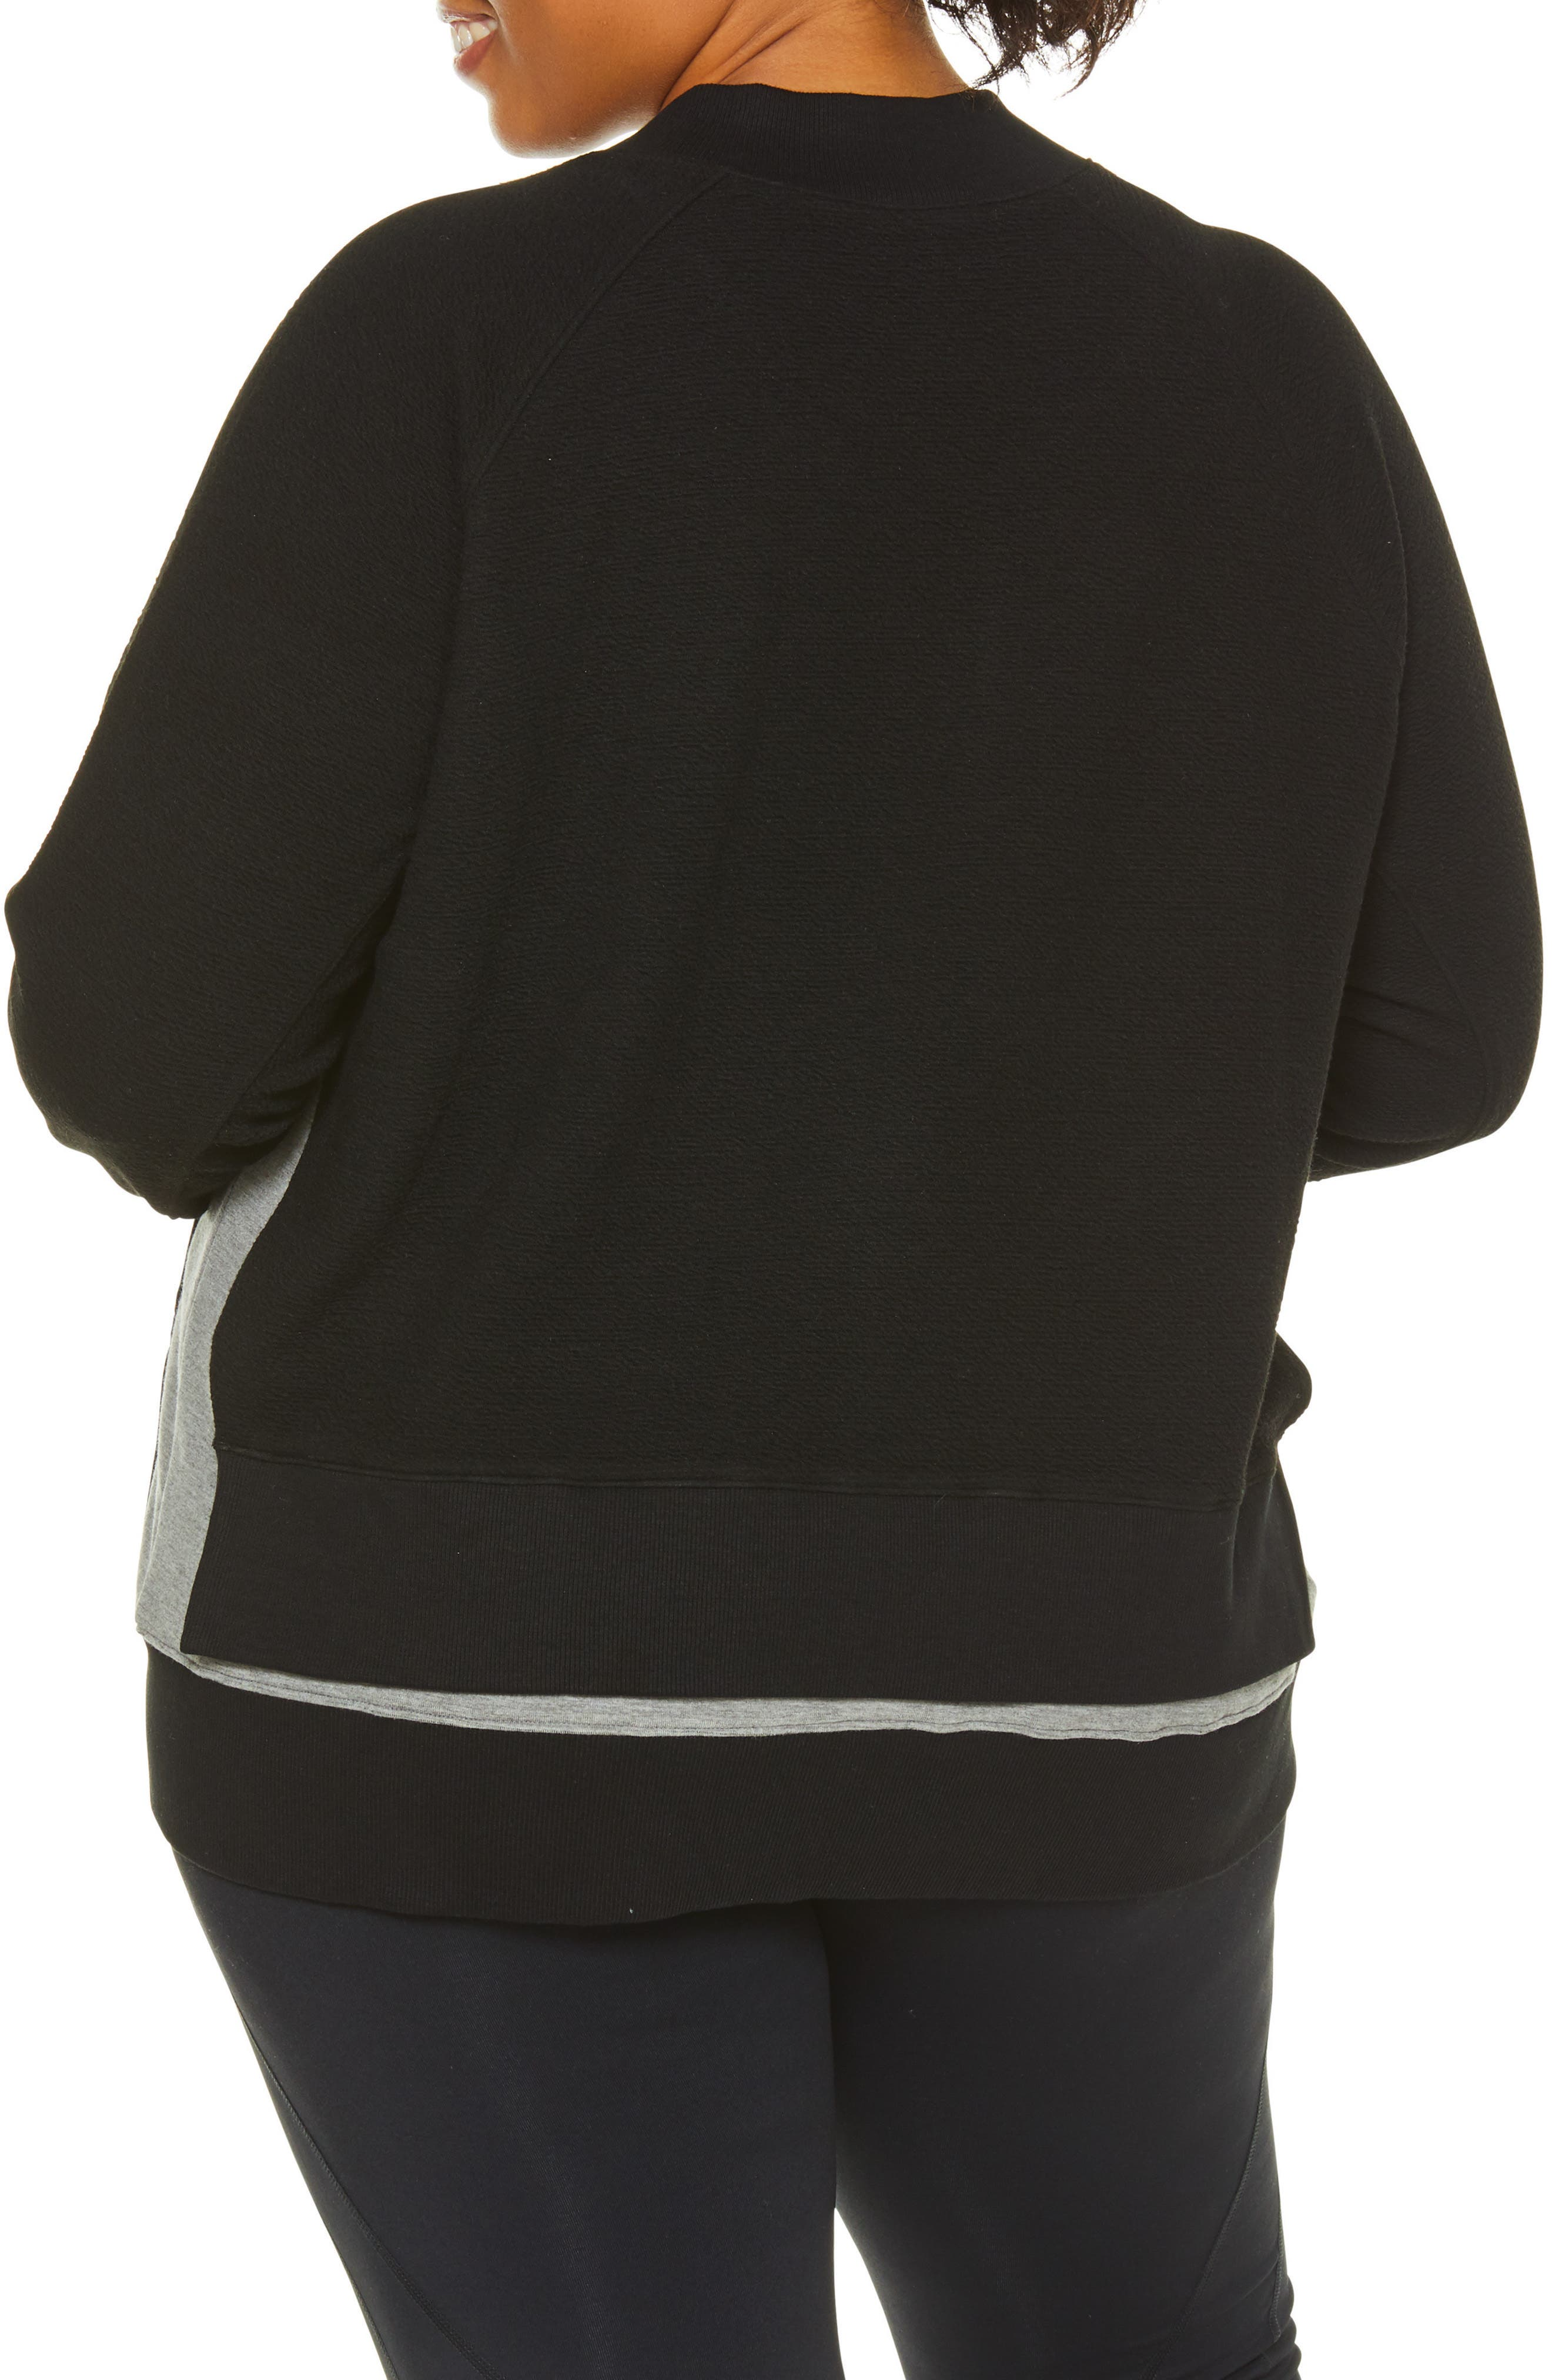 Sublime Double Layer Jacket,                             Alternate thumbnail 2, color,                             BLACK/ GREY HEATHER